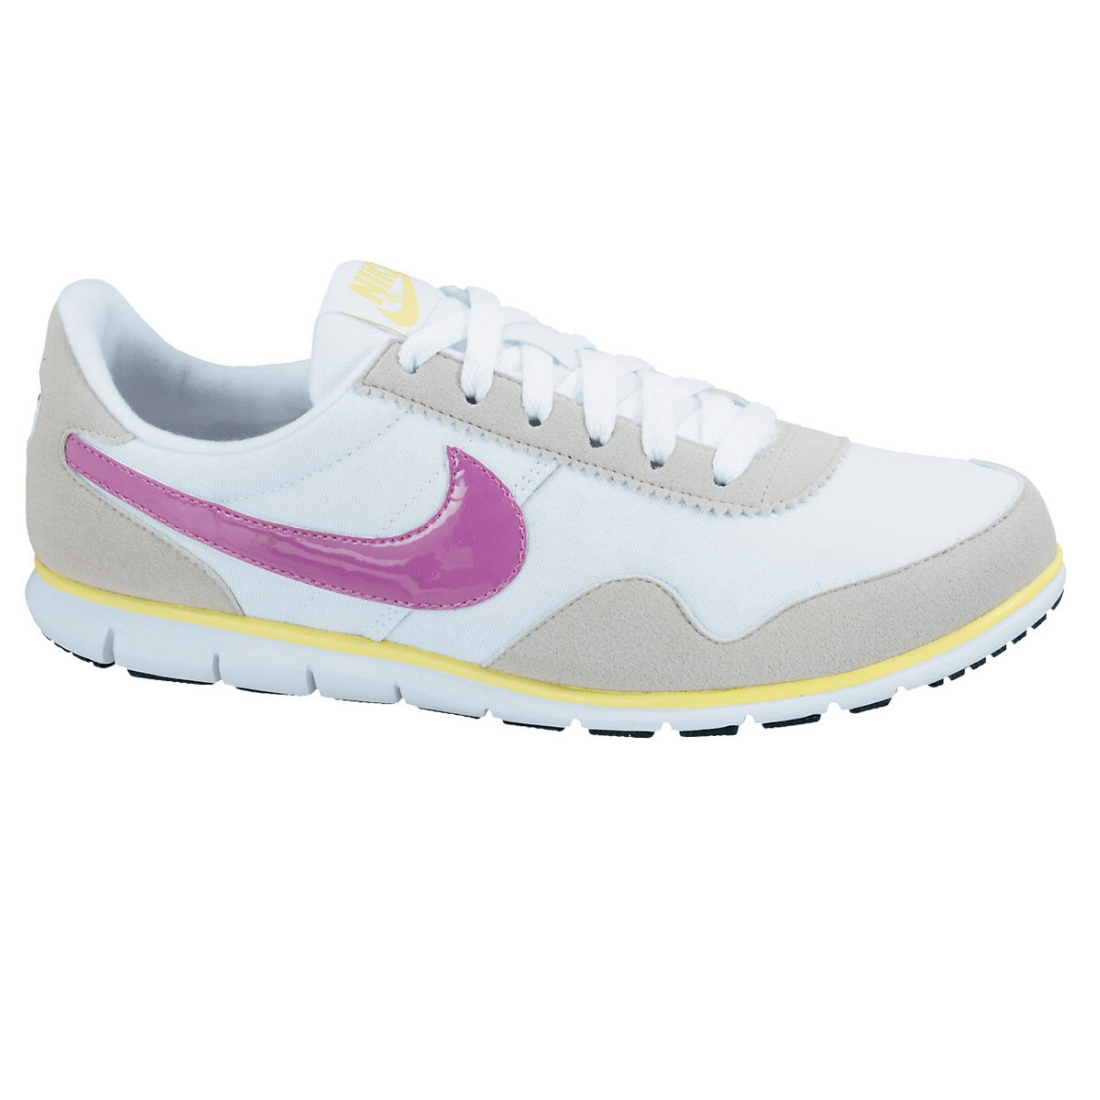 Nike Cortez Damen Ebay